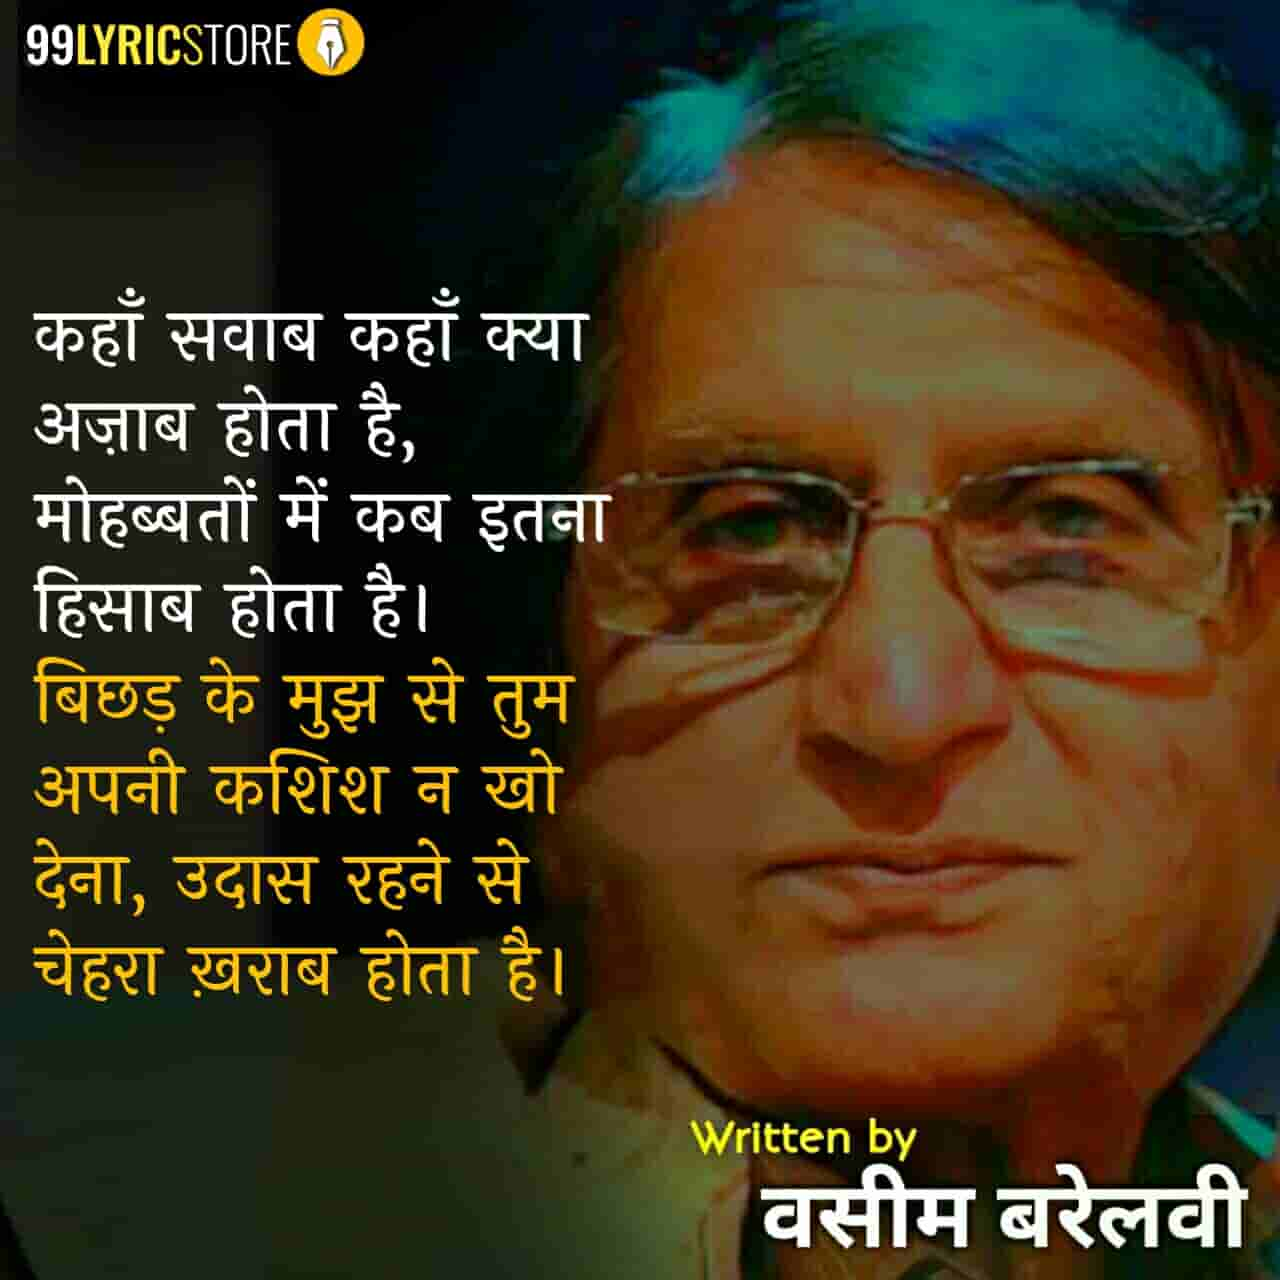 This beautiful ghazal Kahan Sawaab Kahan Kya Azaab Hota Hai has written by Waseem Barelvi.